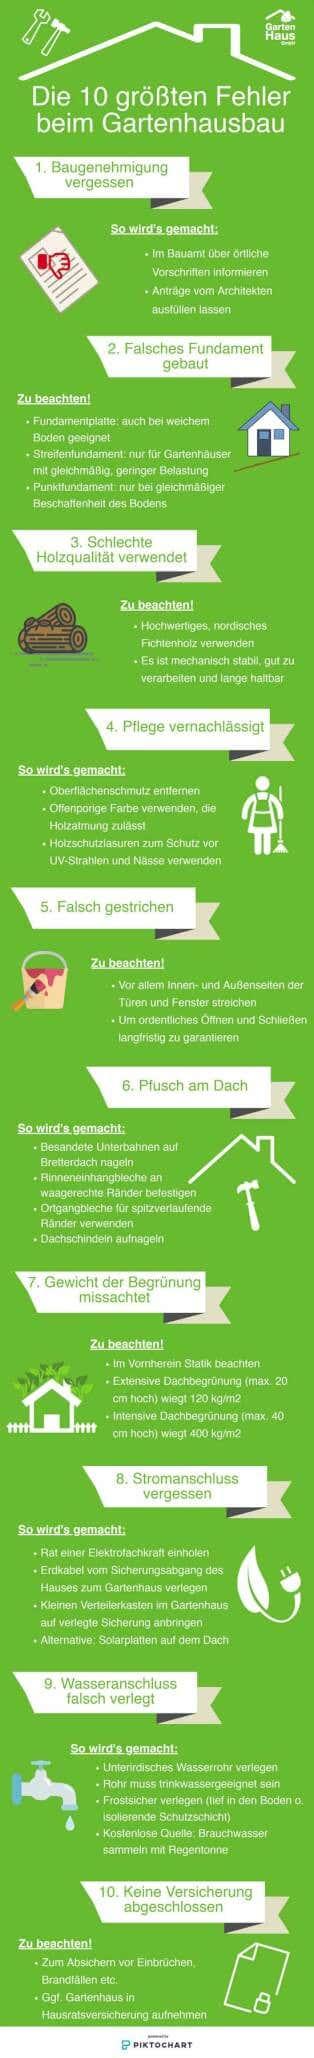 10 fehler gartenhausbau